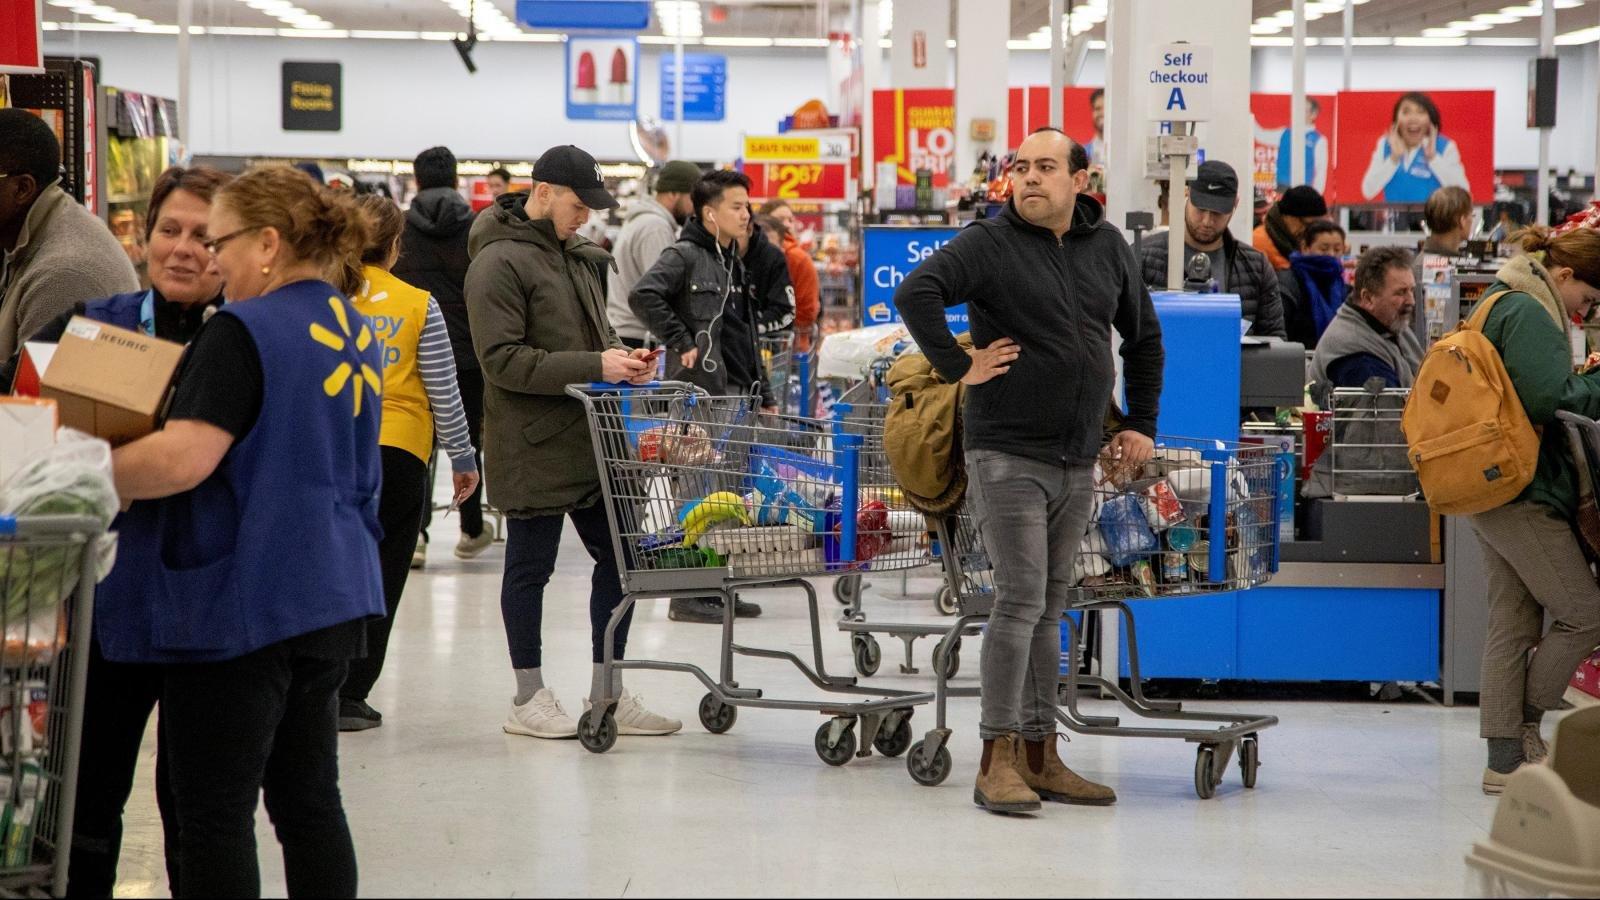 Walmart makes face masks mandatory for workers amid coronavirus ...